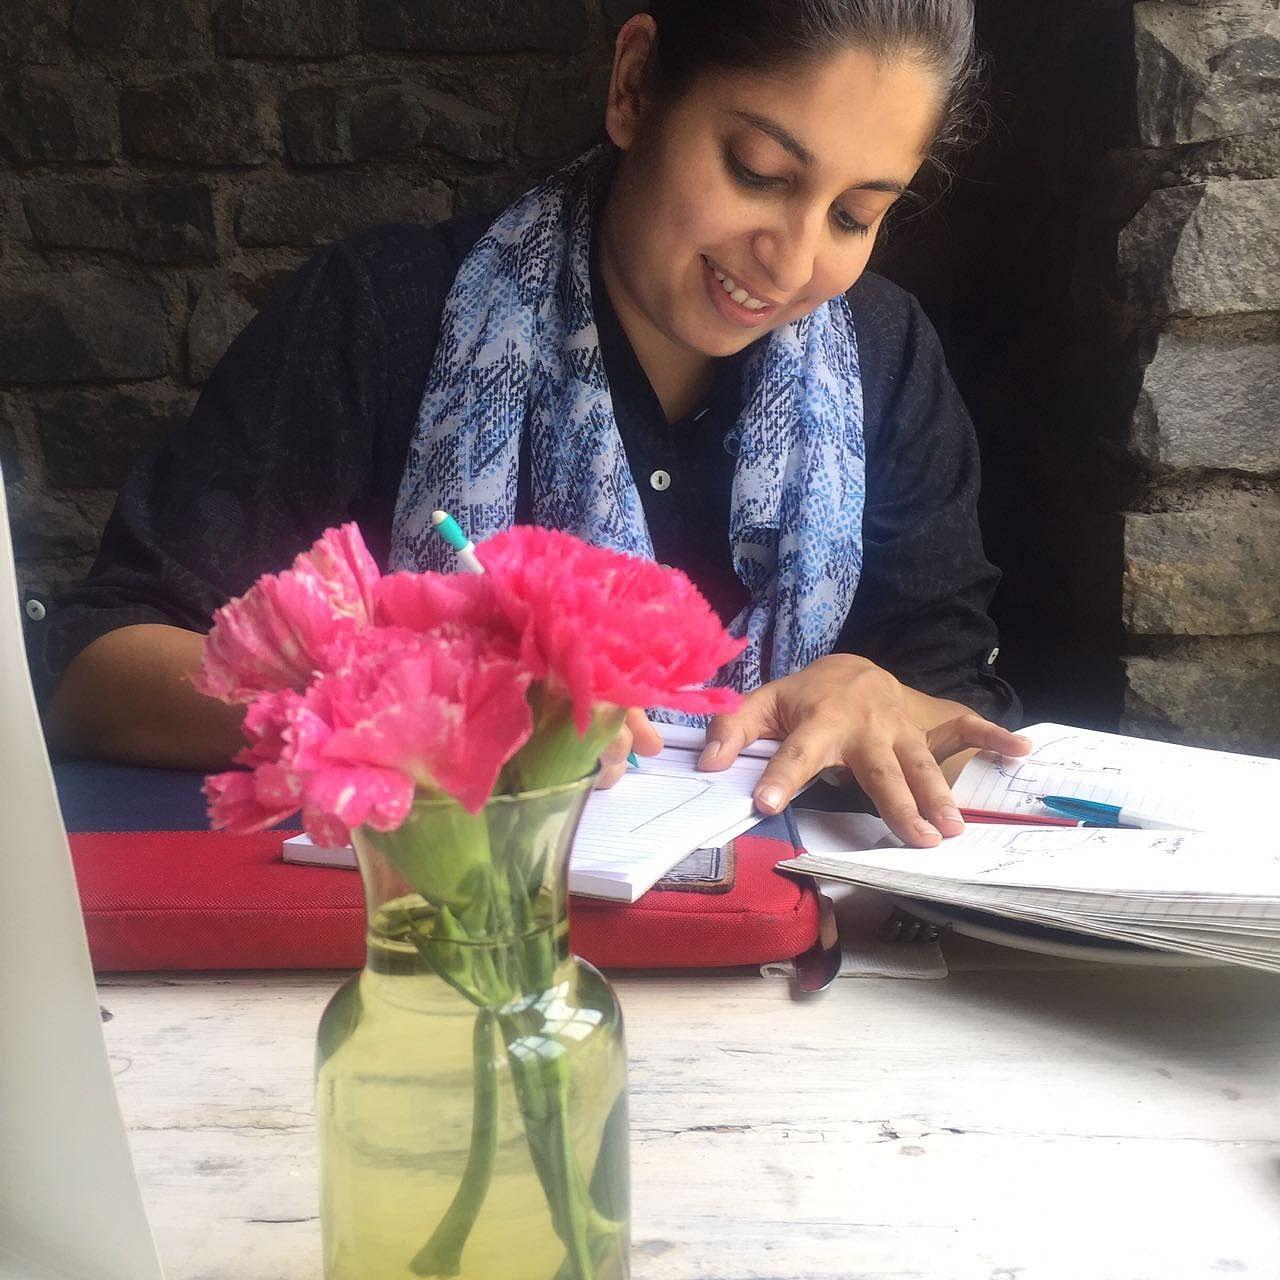 Delhi-based designer and founder of Izel Labs and Izel Homes, Kanika Gupta.